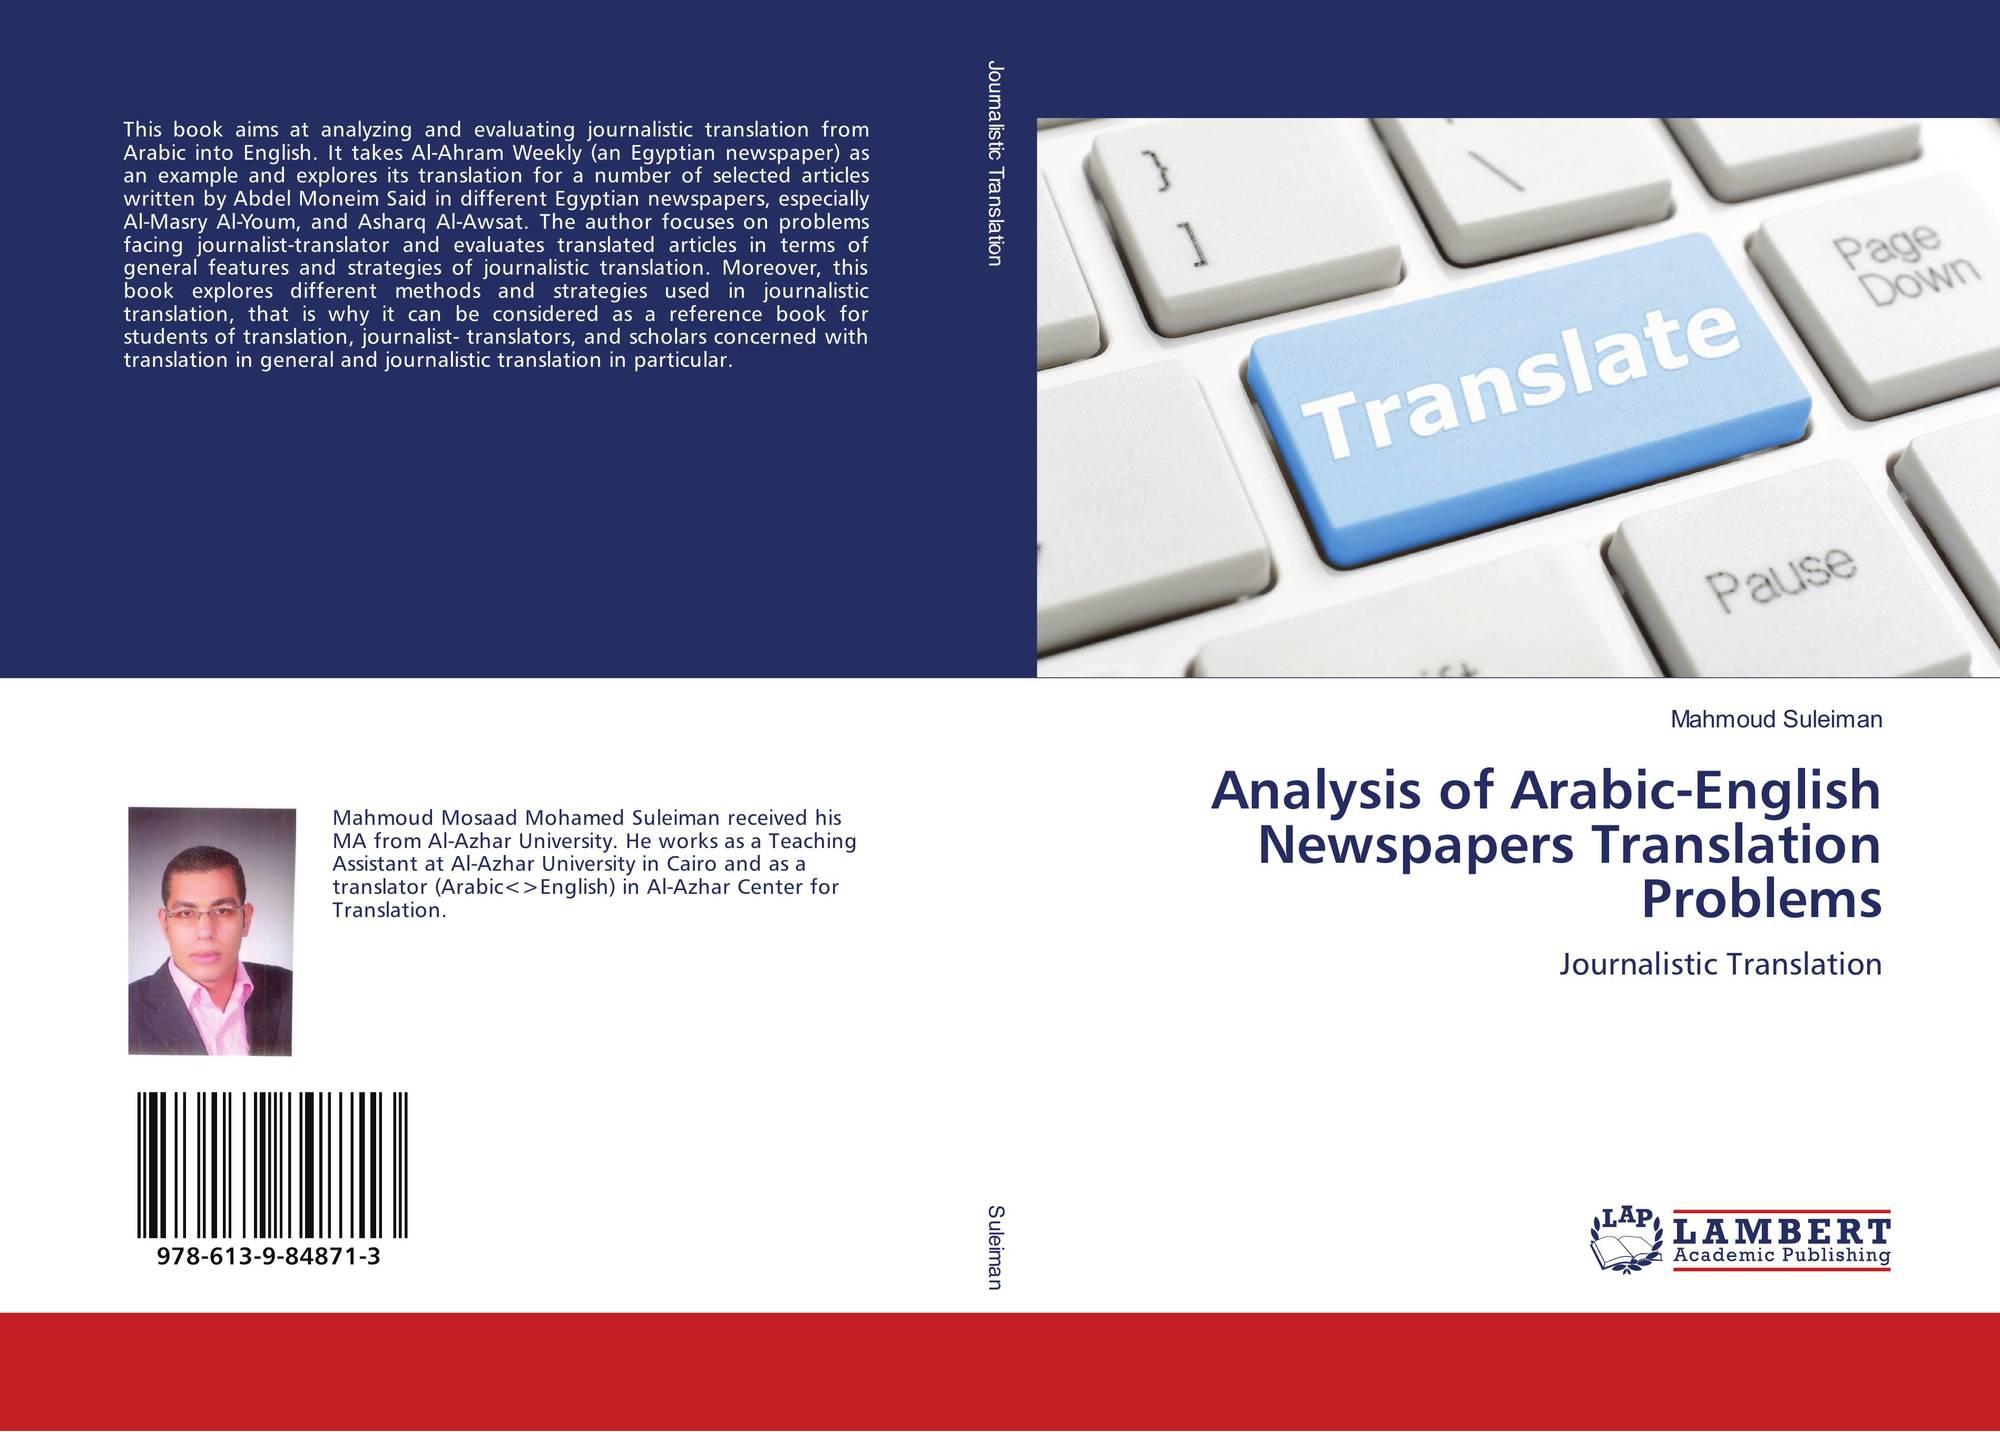 Analysis of Arabic-English Newspapers Translation Problems